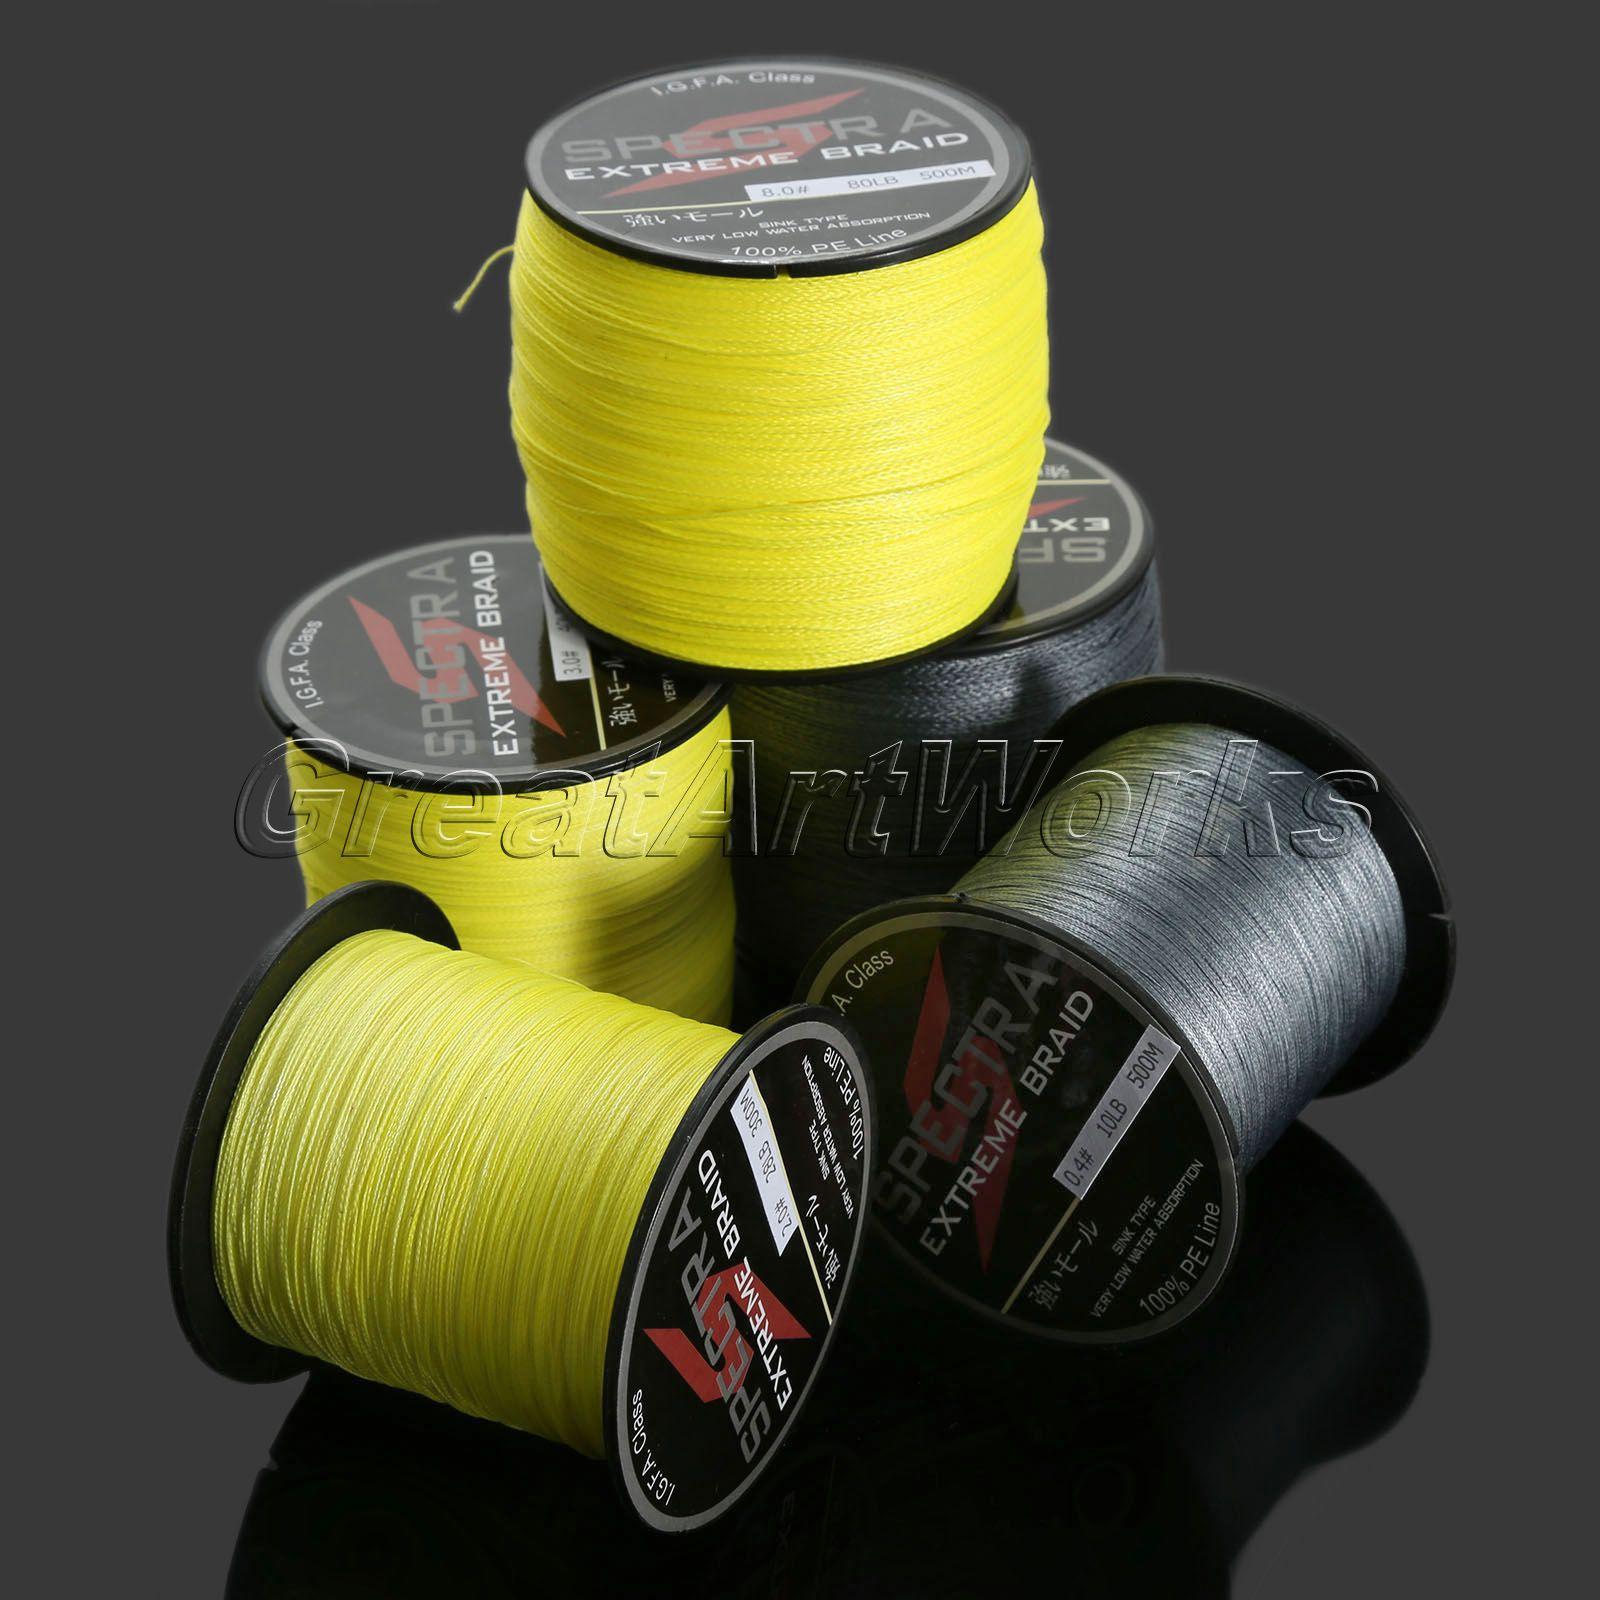 NEW 300M PE Lines Carp Fishing Line Multifilament Super Braided 4 Strands 10-80LB Premium For Fish Rope Cord(China (Mainland))